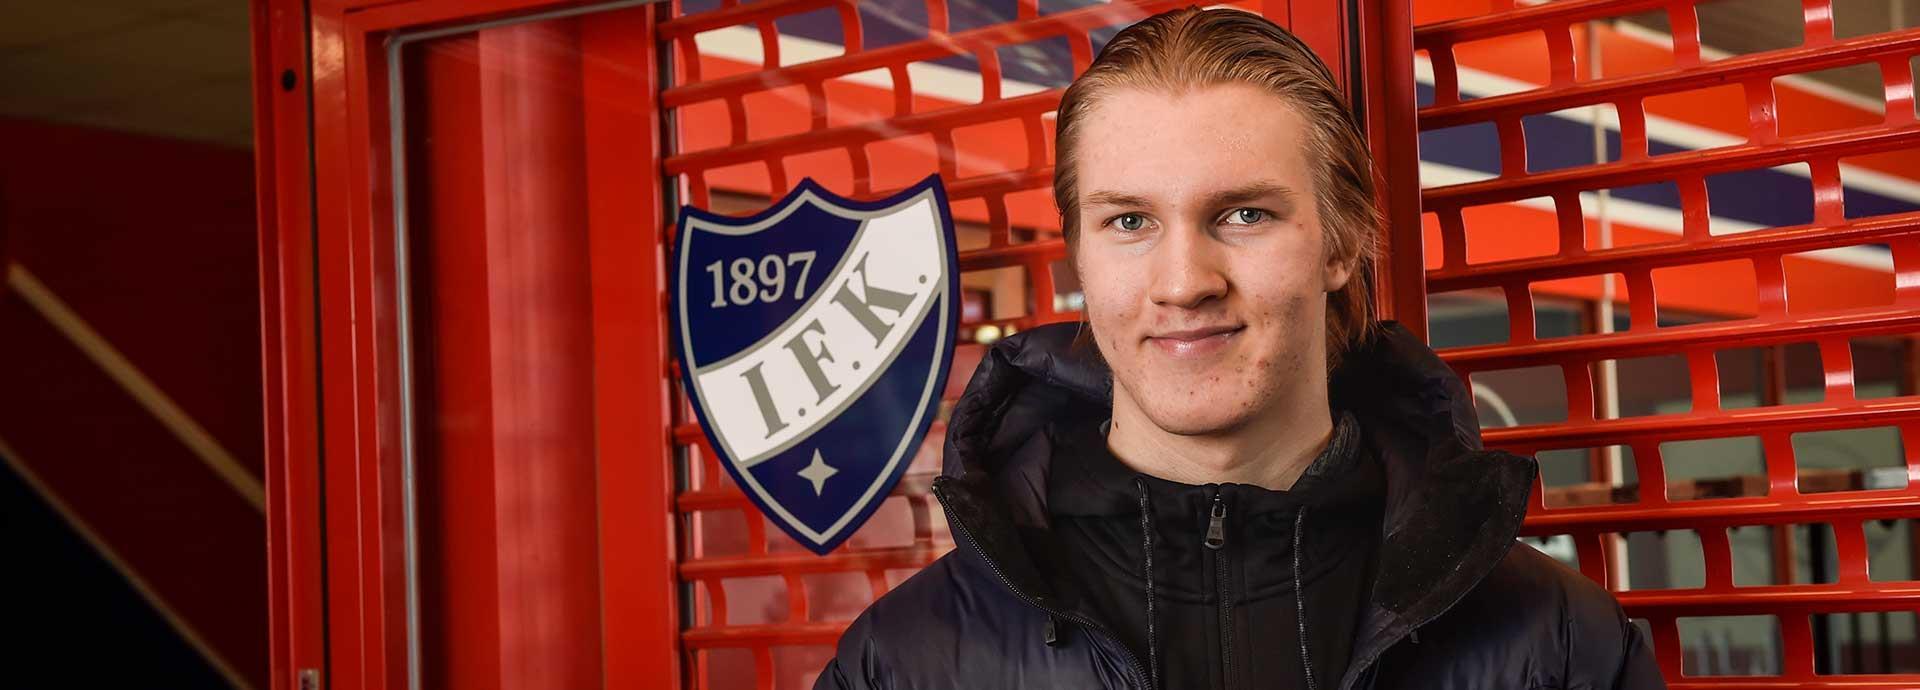 Anton Lundell is always in it to win it